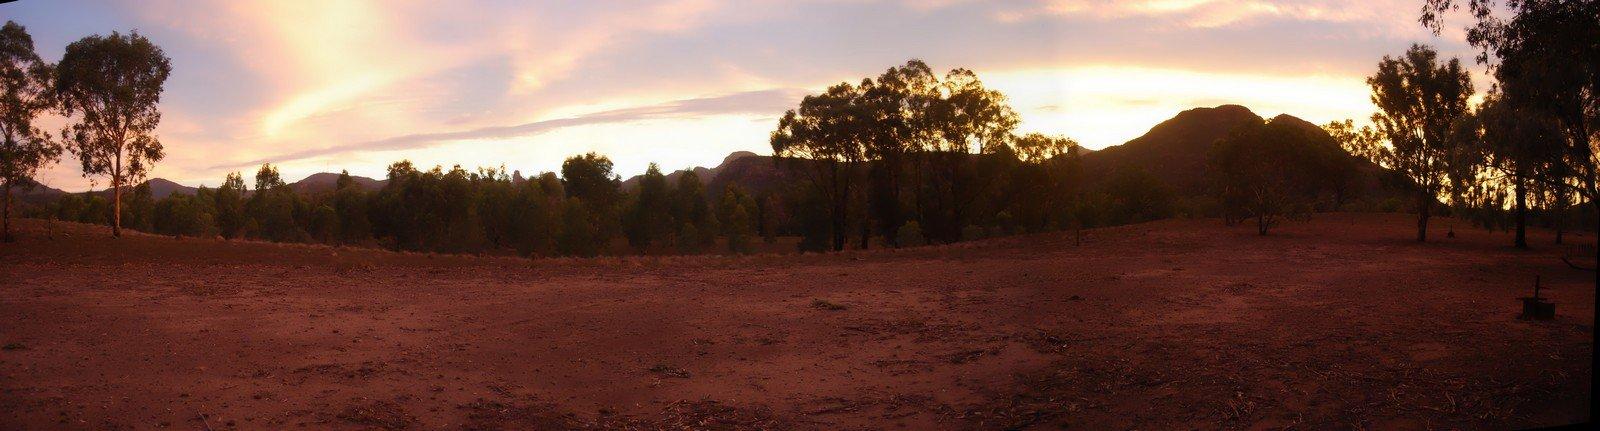 Warrumbungles Sunset